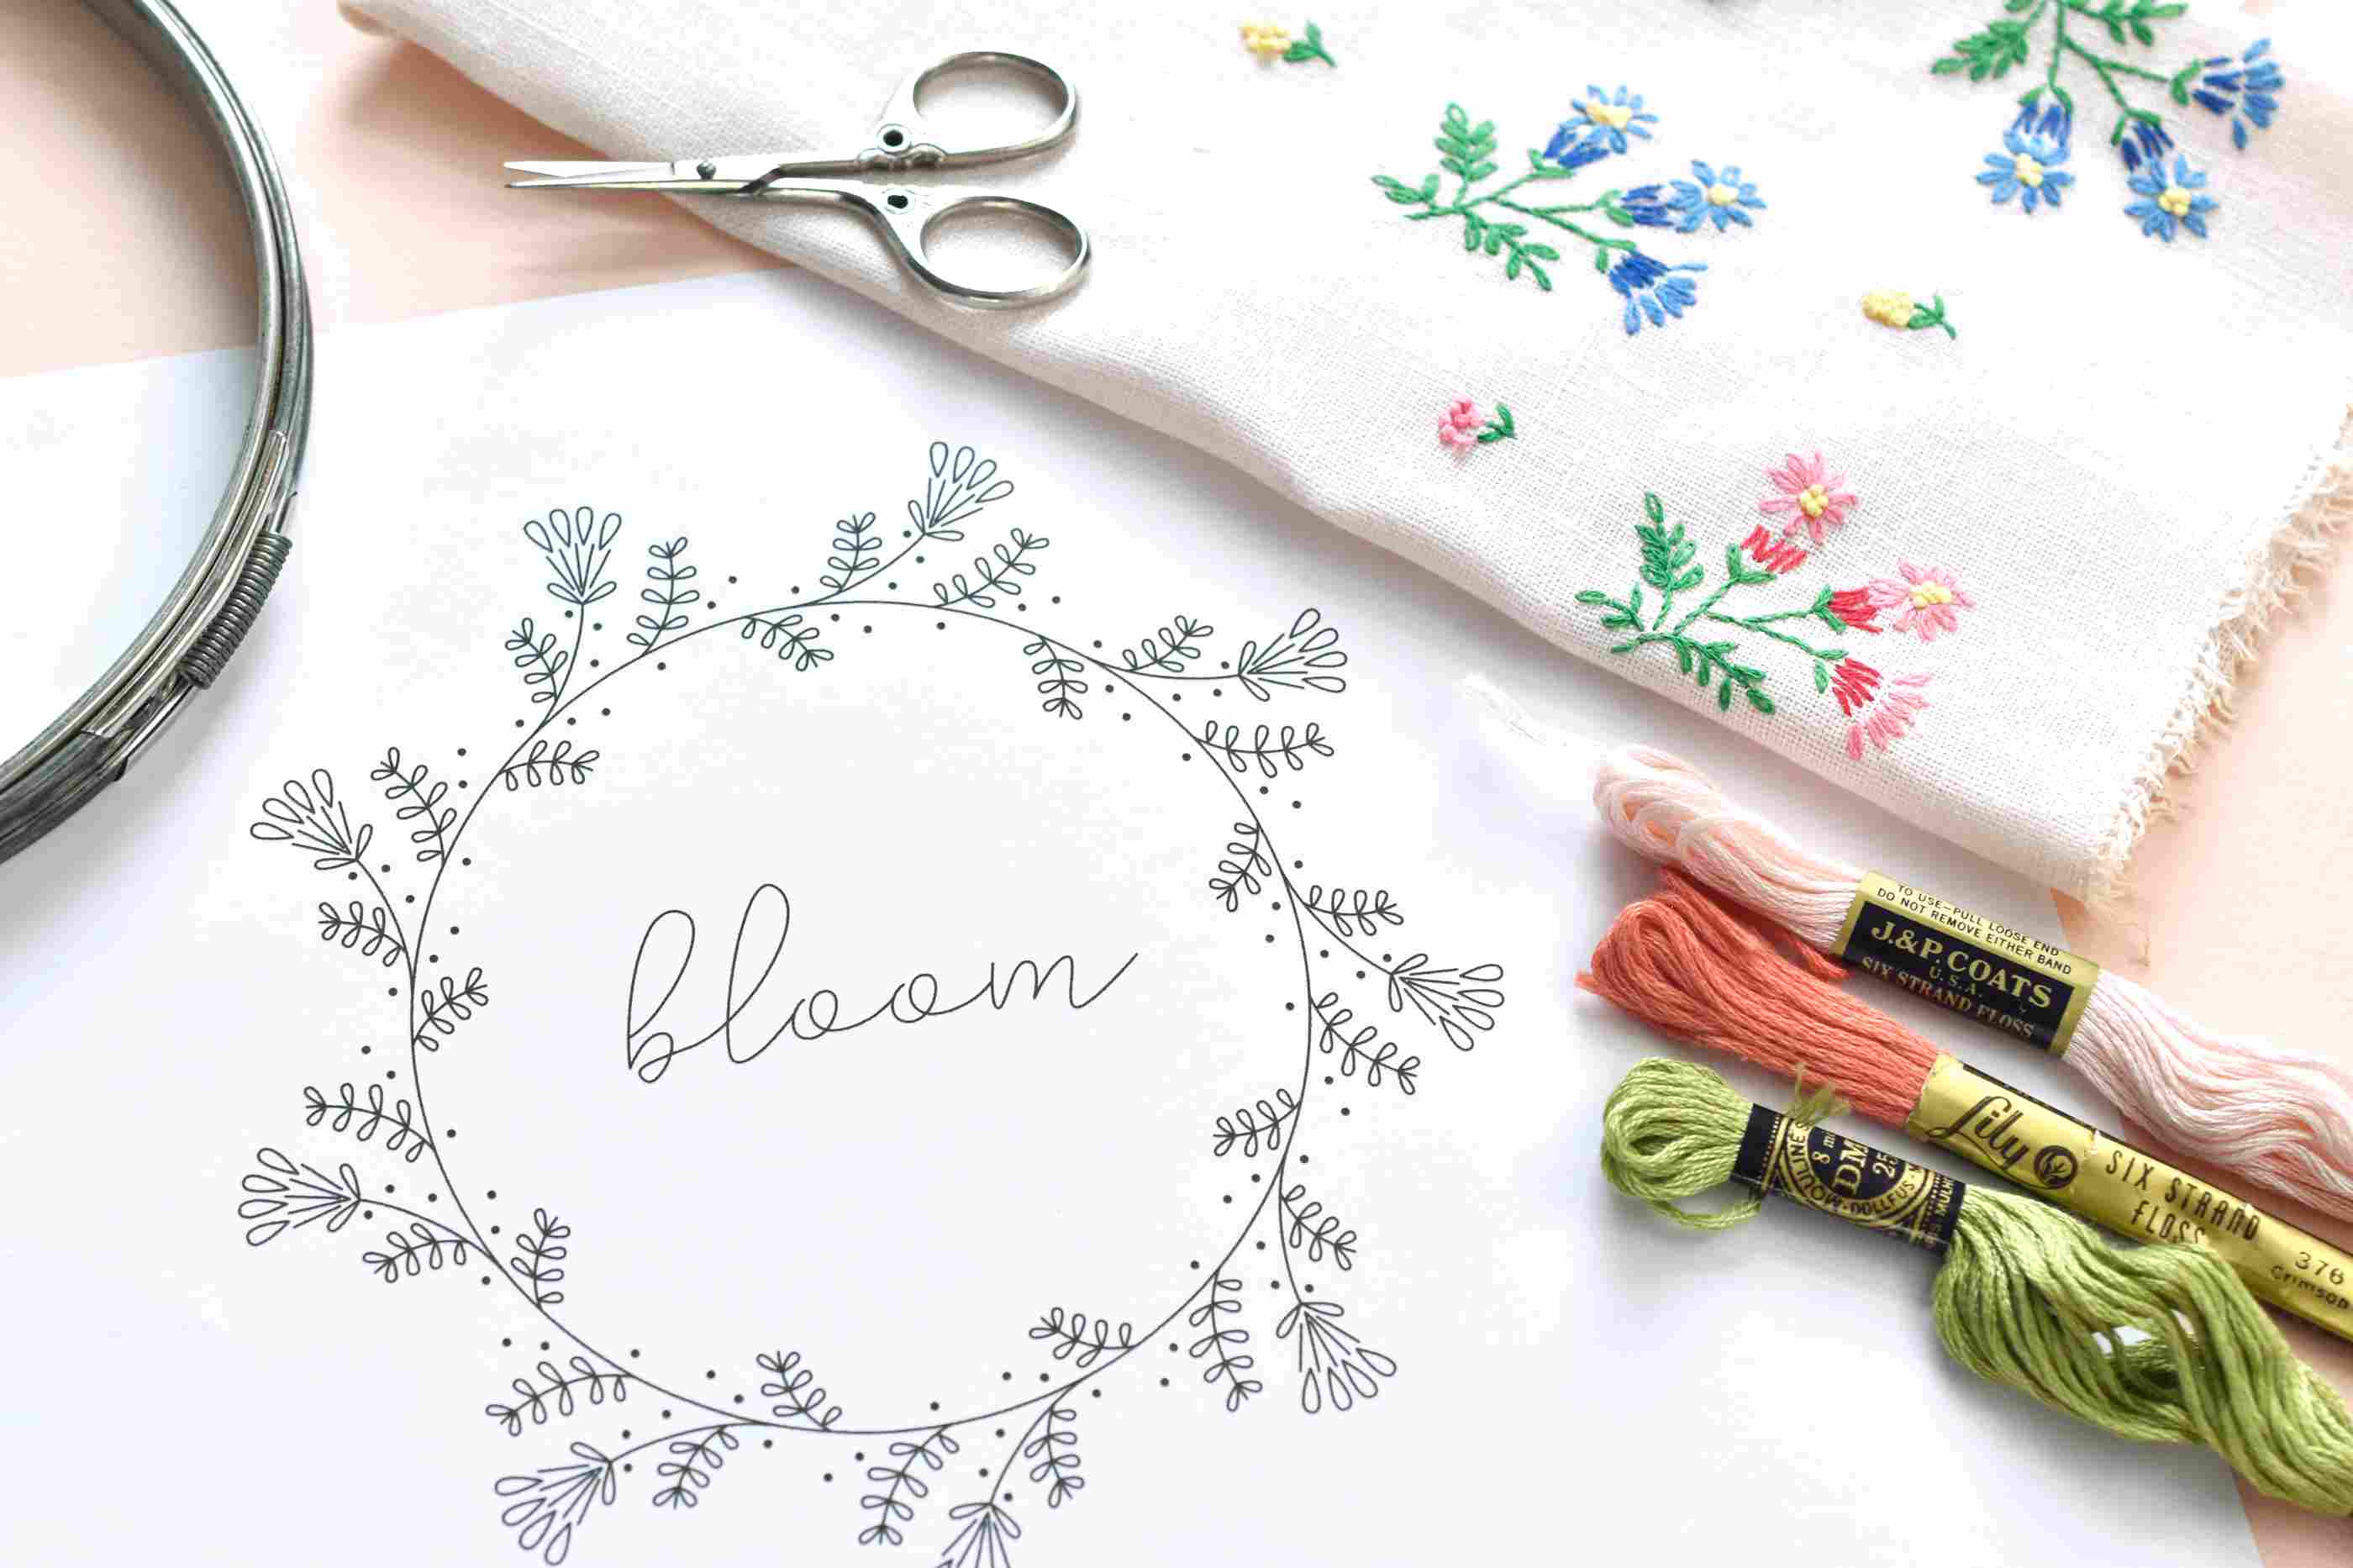 Vintage-Inspired Bloom Frame Embroidery Pattern